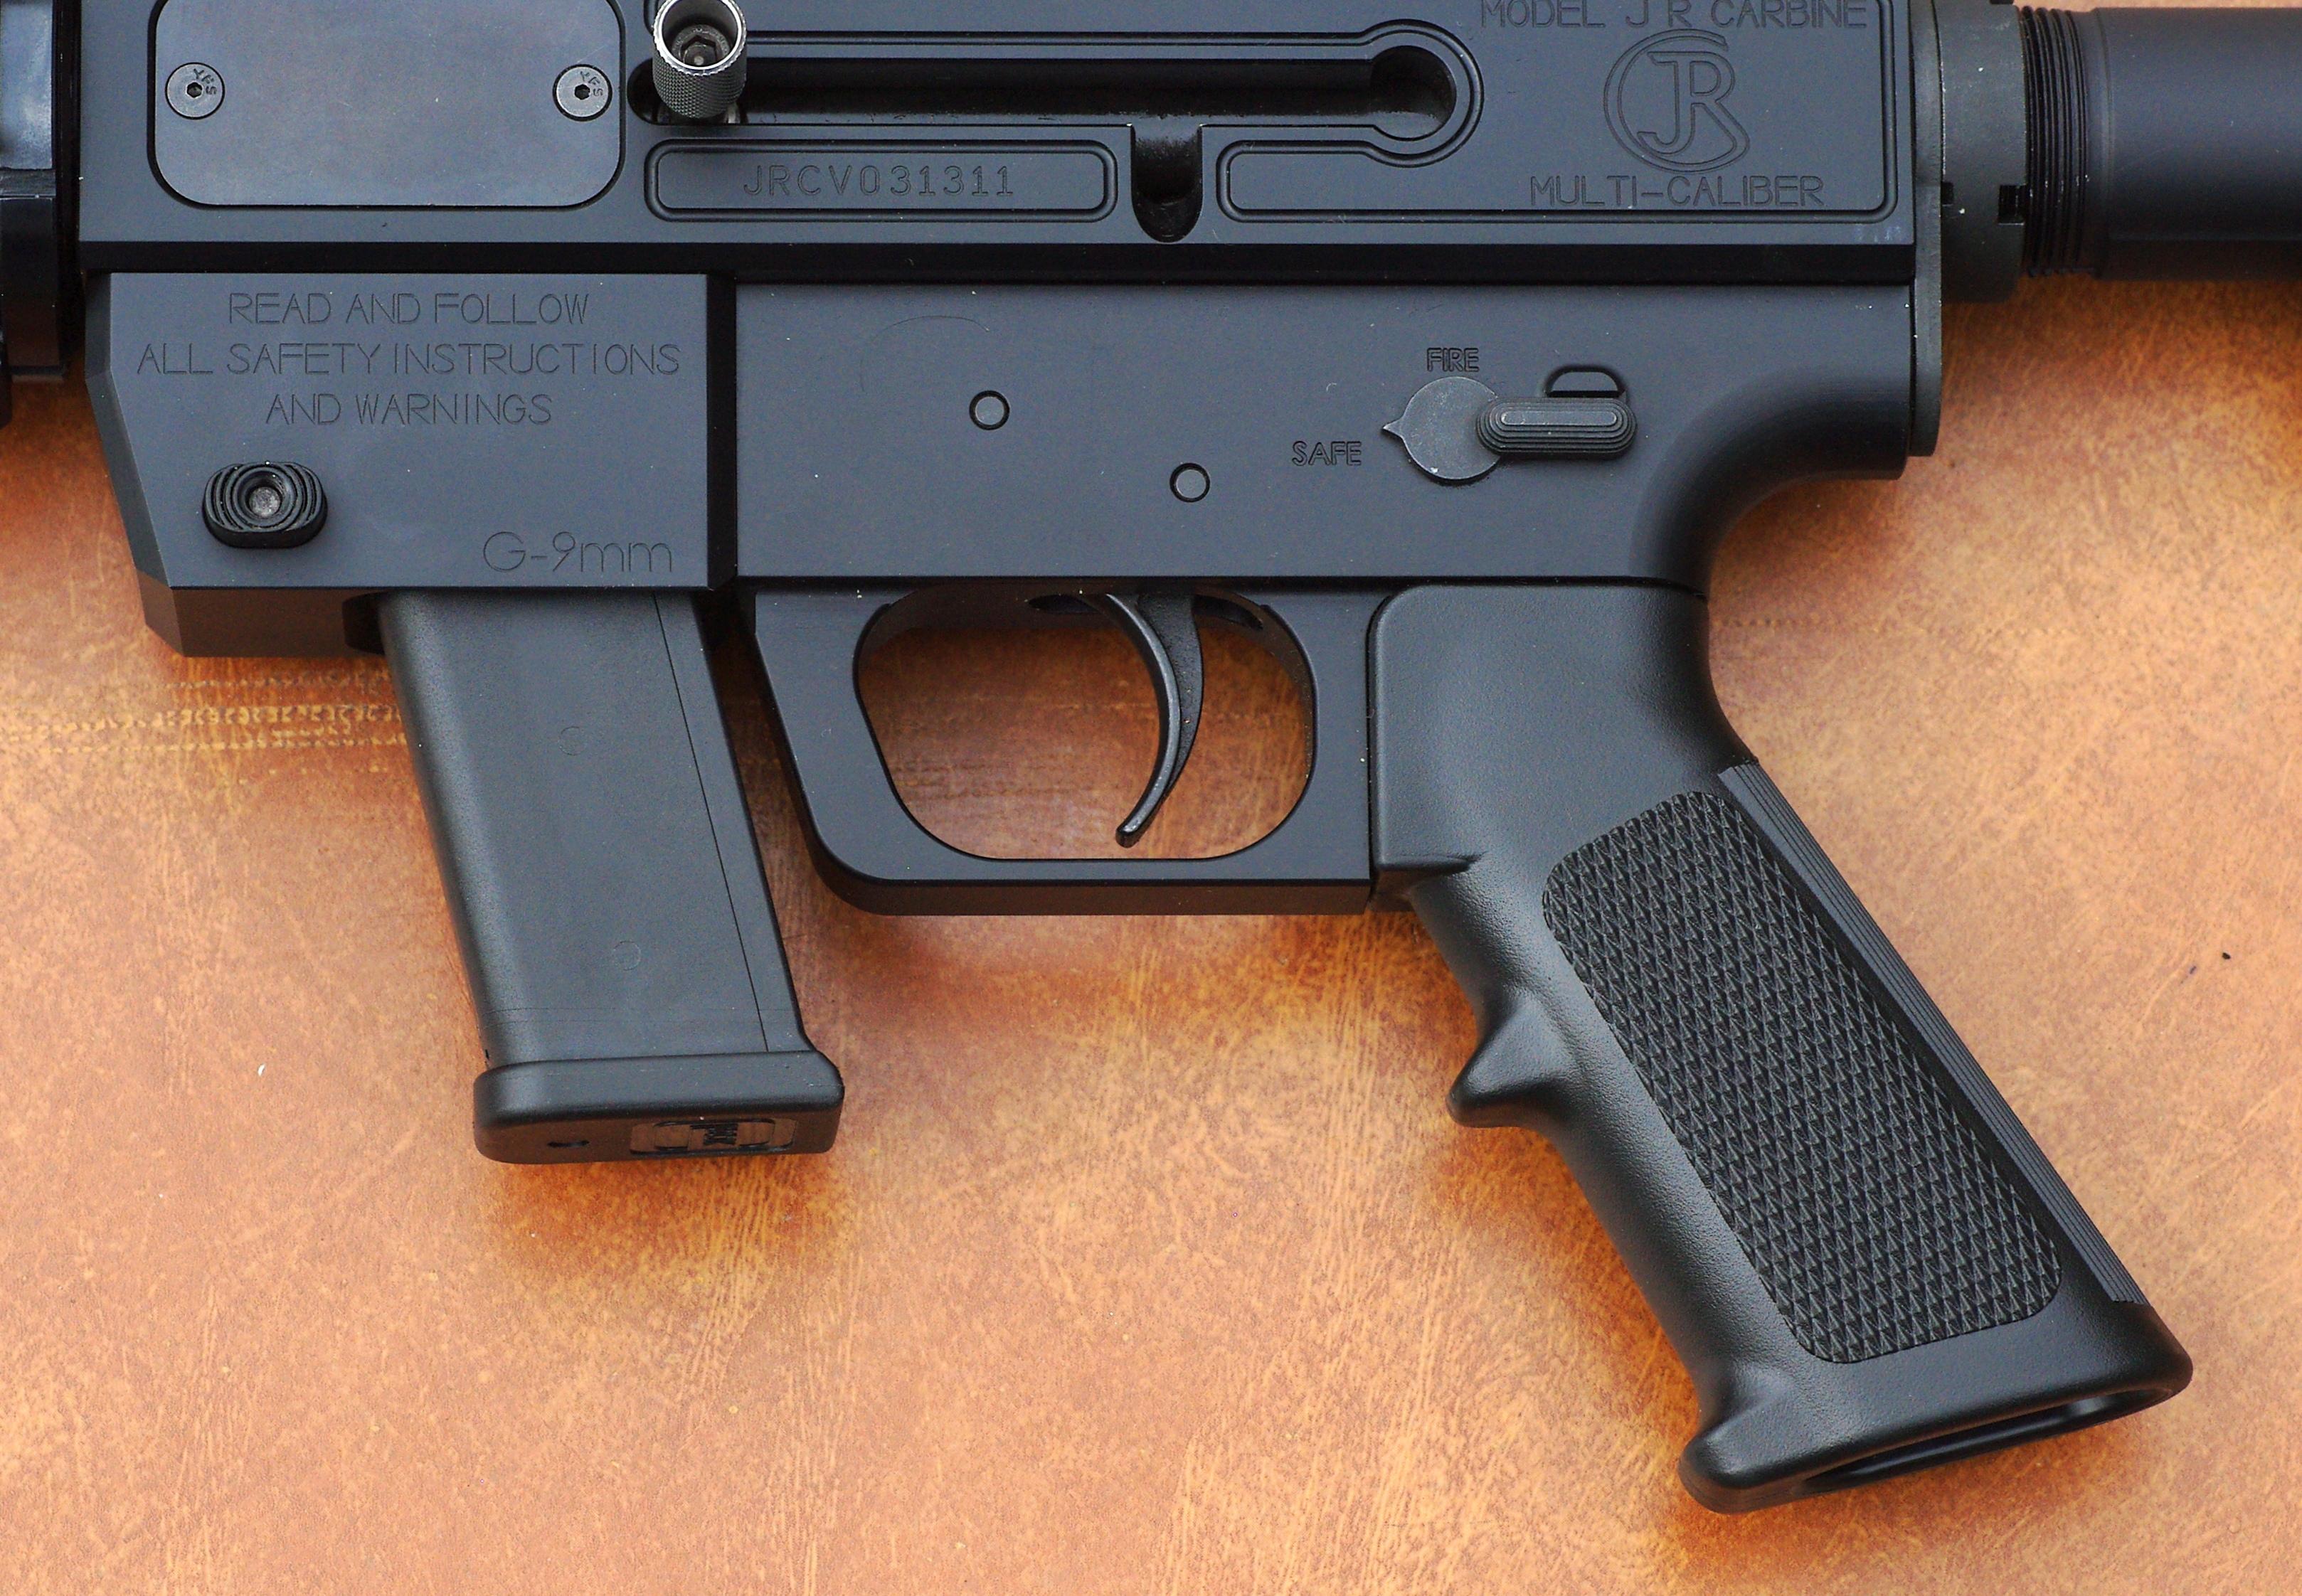 Pistol-Caliber Carbine for Home Defense: Just Right 9mm Carbine